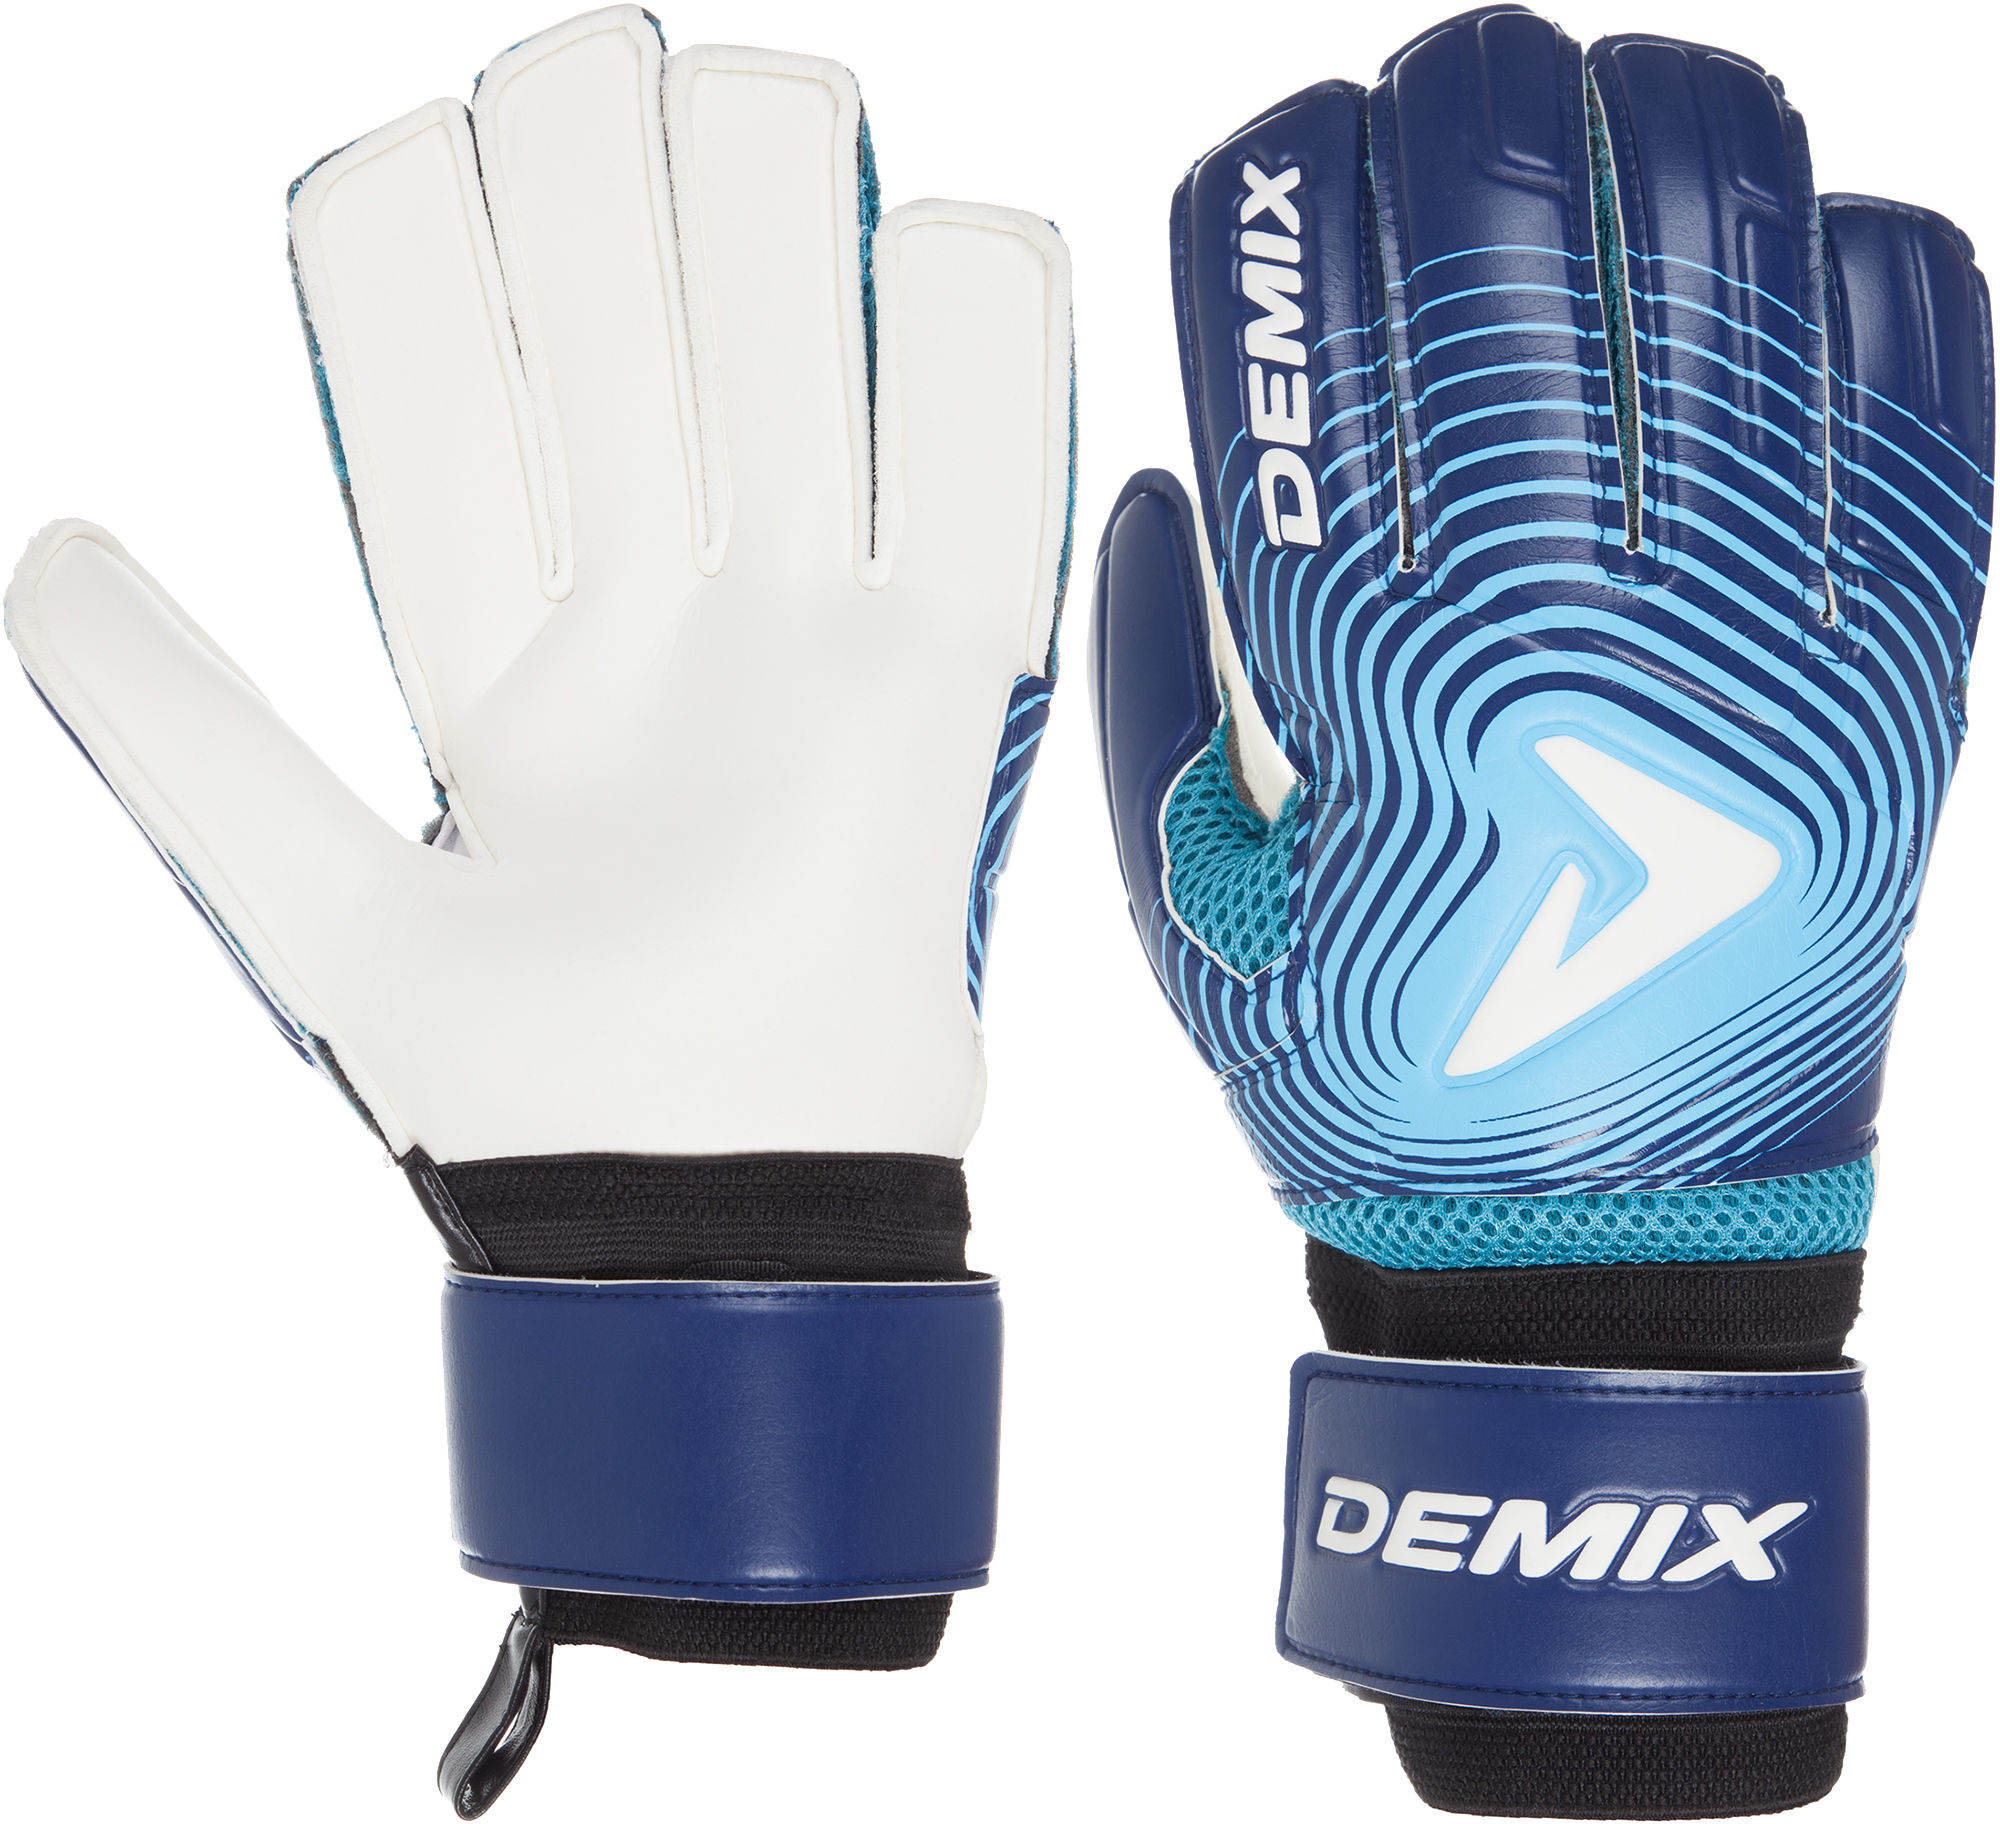 Demix Перчатки вратарские Demix, размер 10 цена